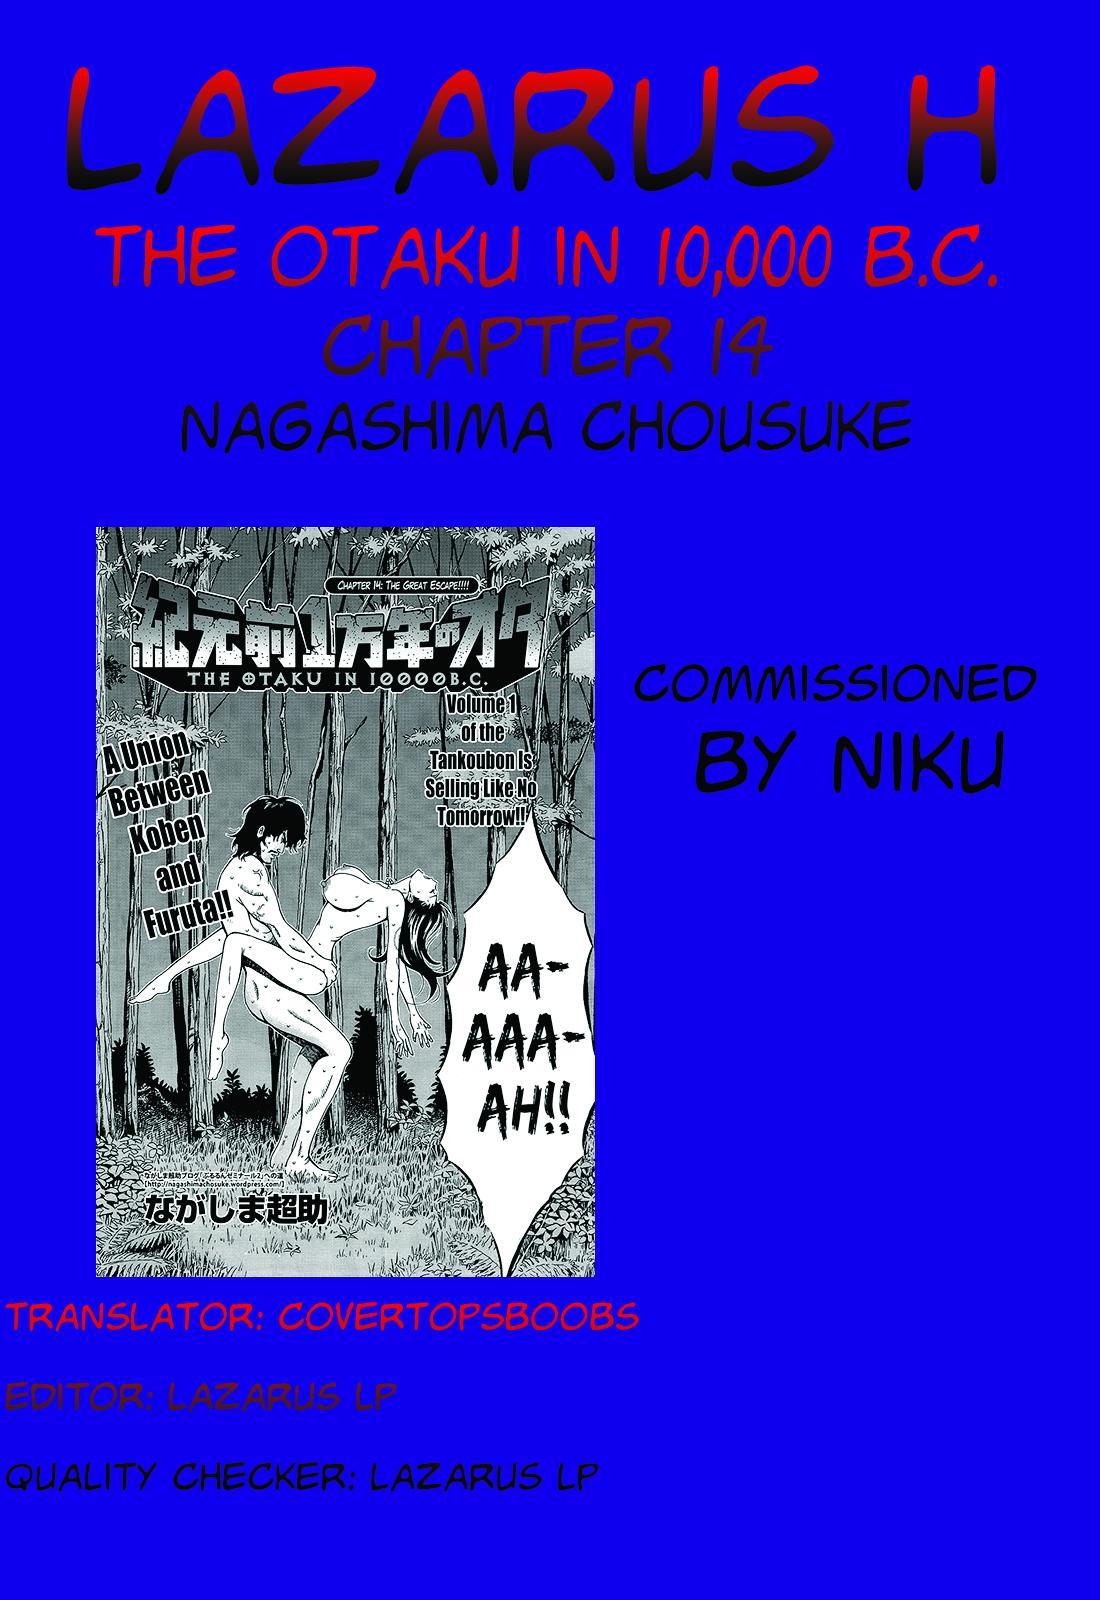 Kigenzen 10000 Nen no Ota | The Otaku in 10,000 B.C. 270